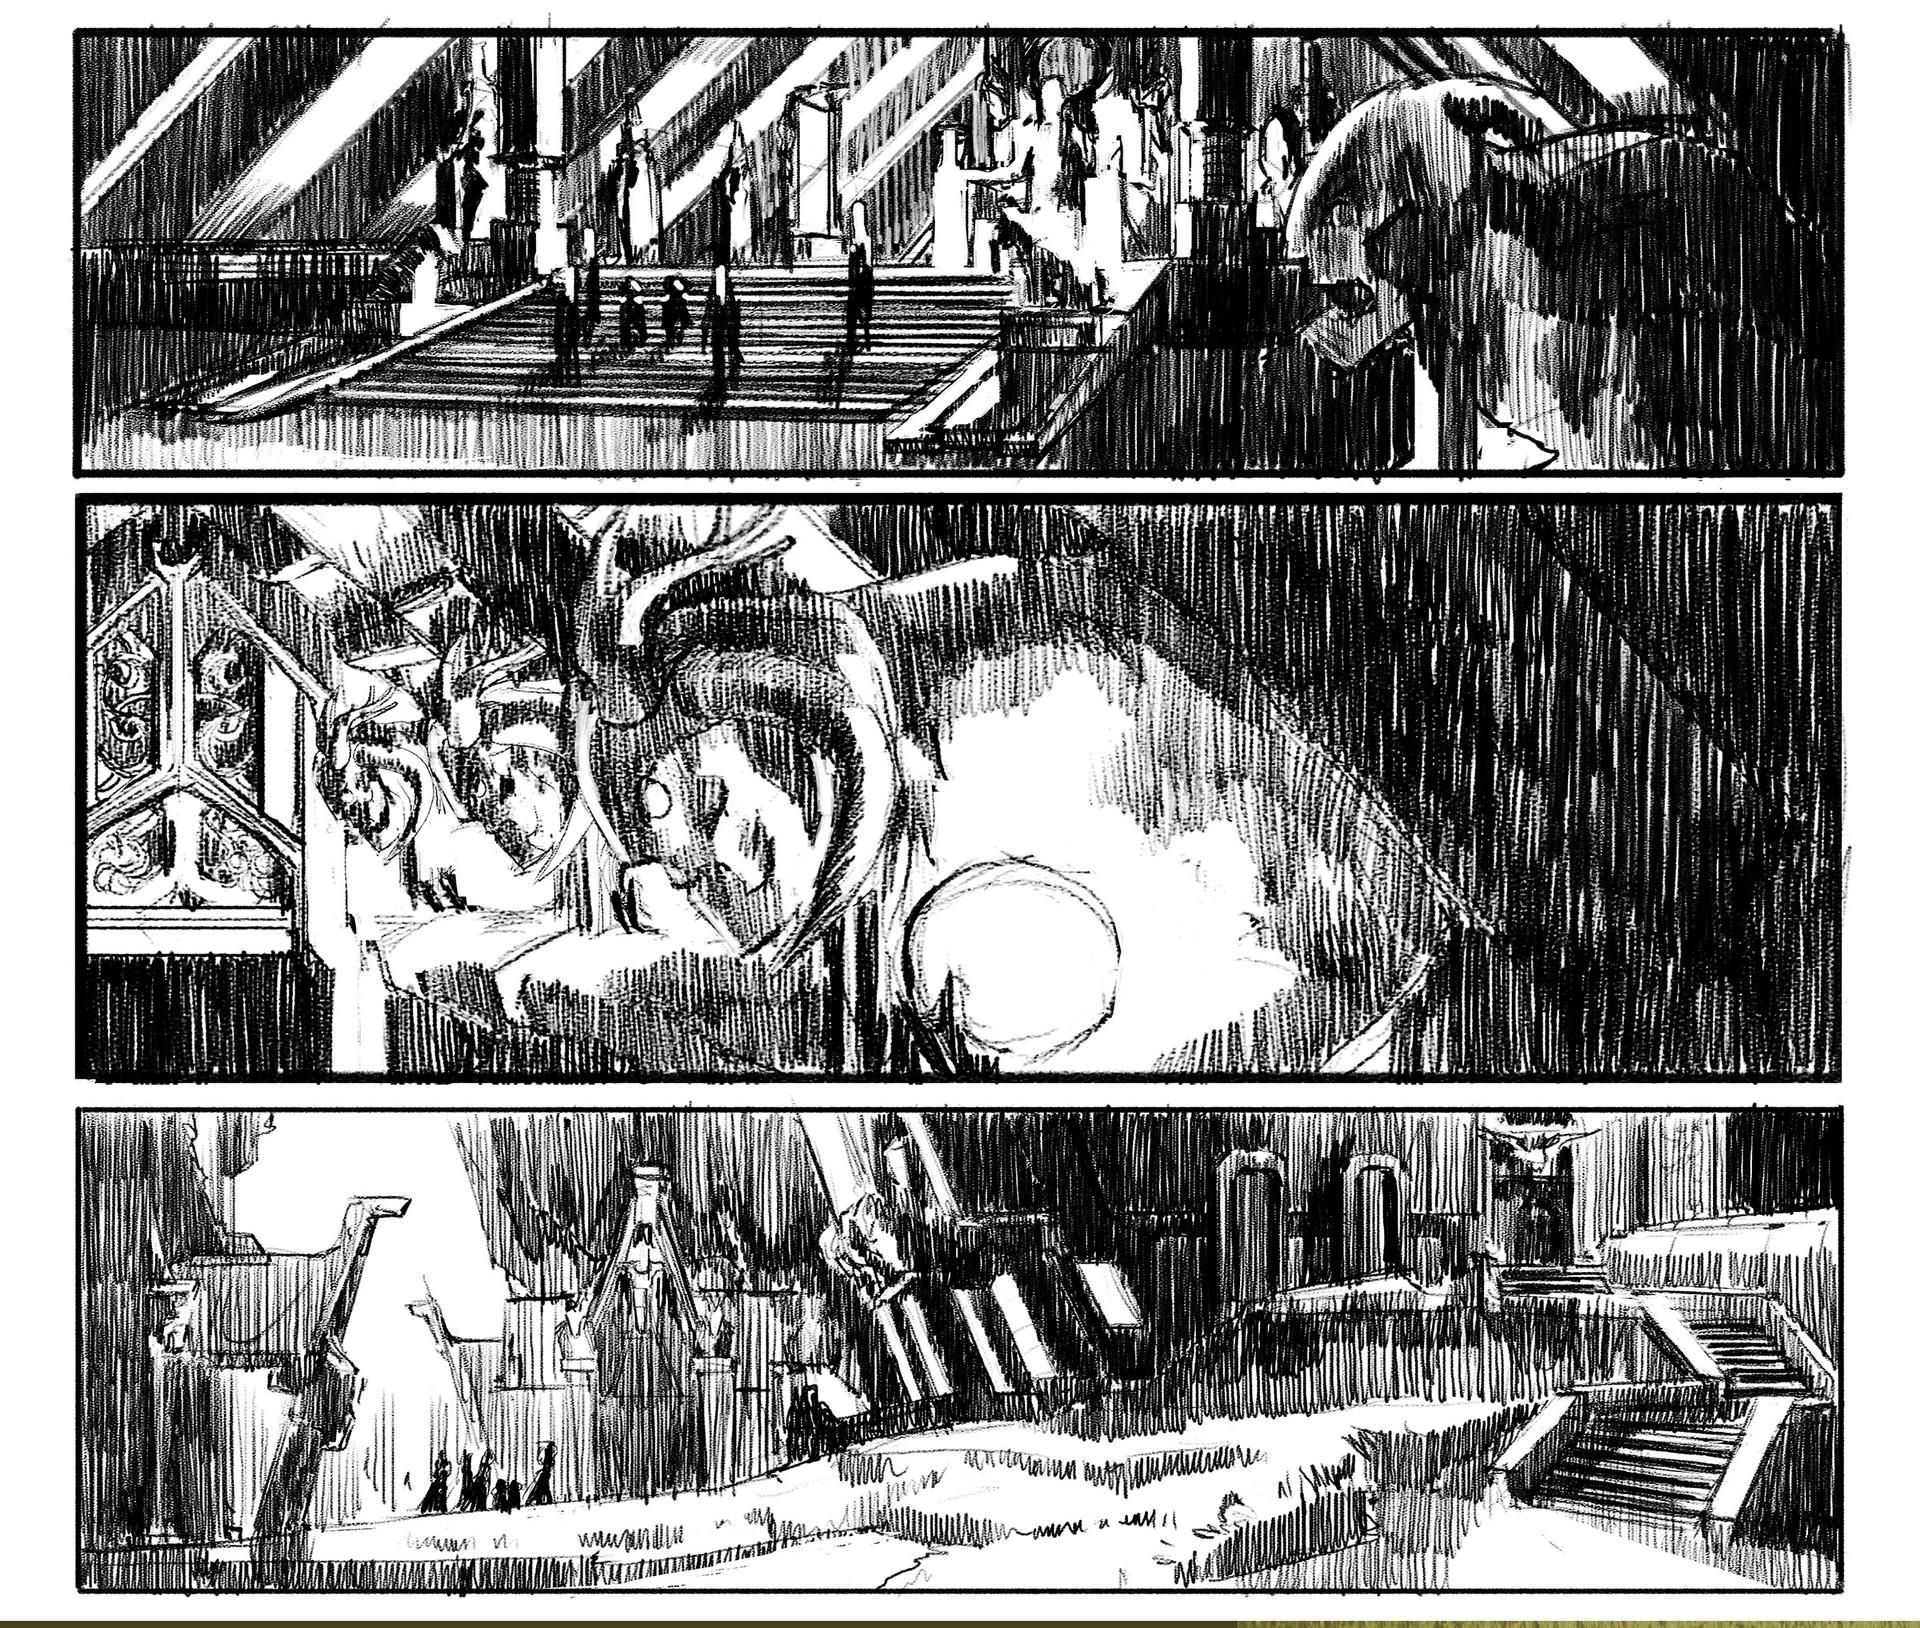 Marina ortega composition sketches 2